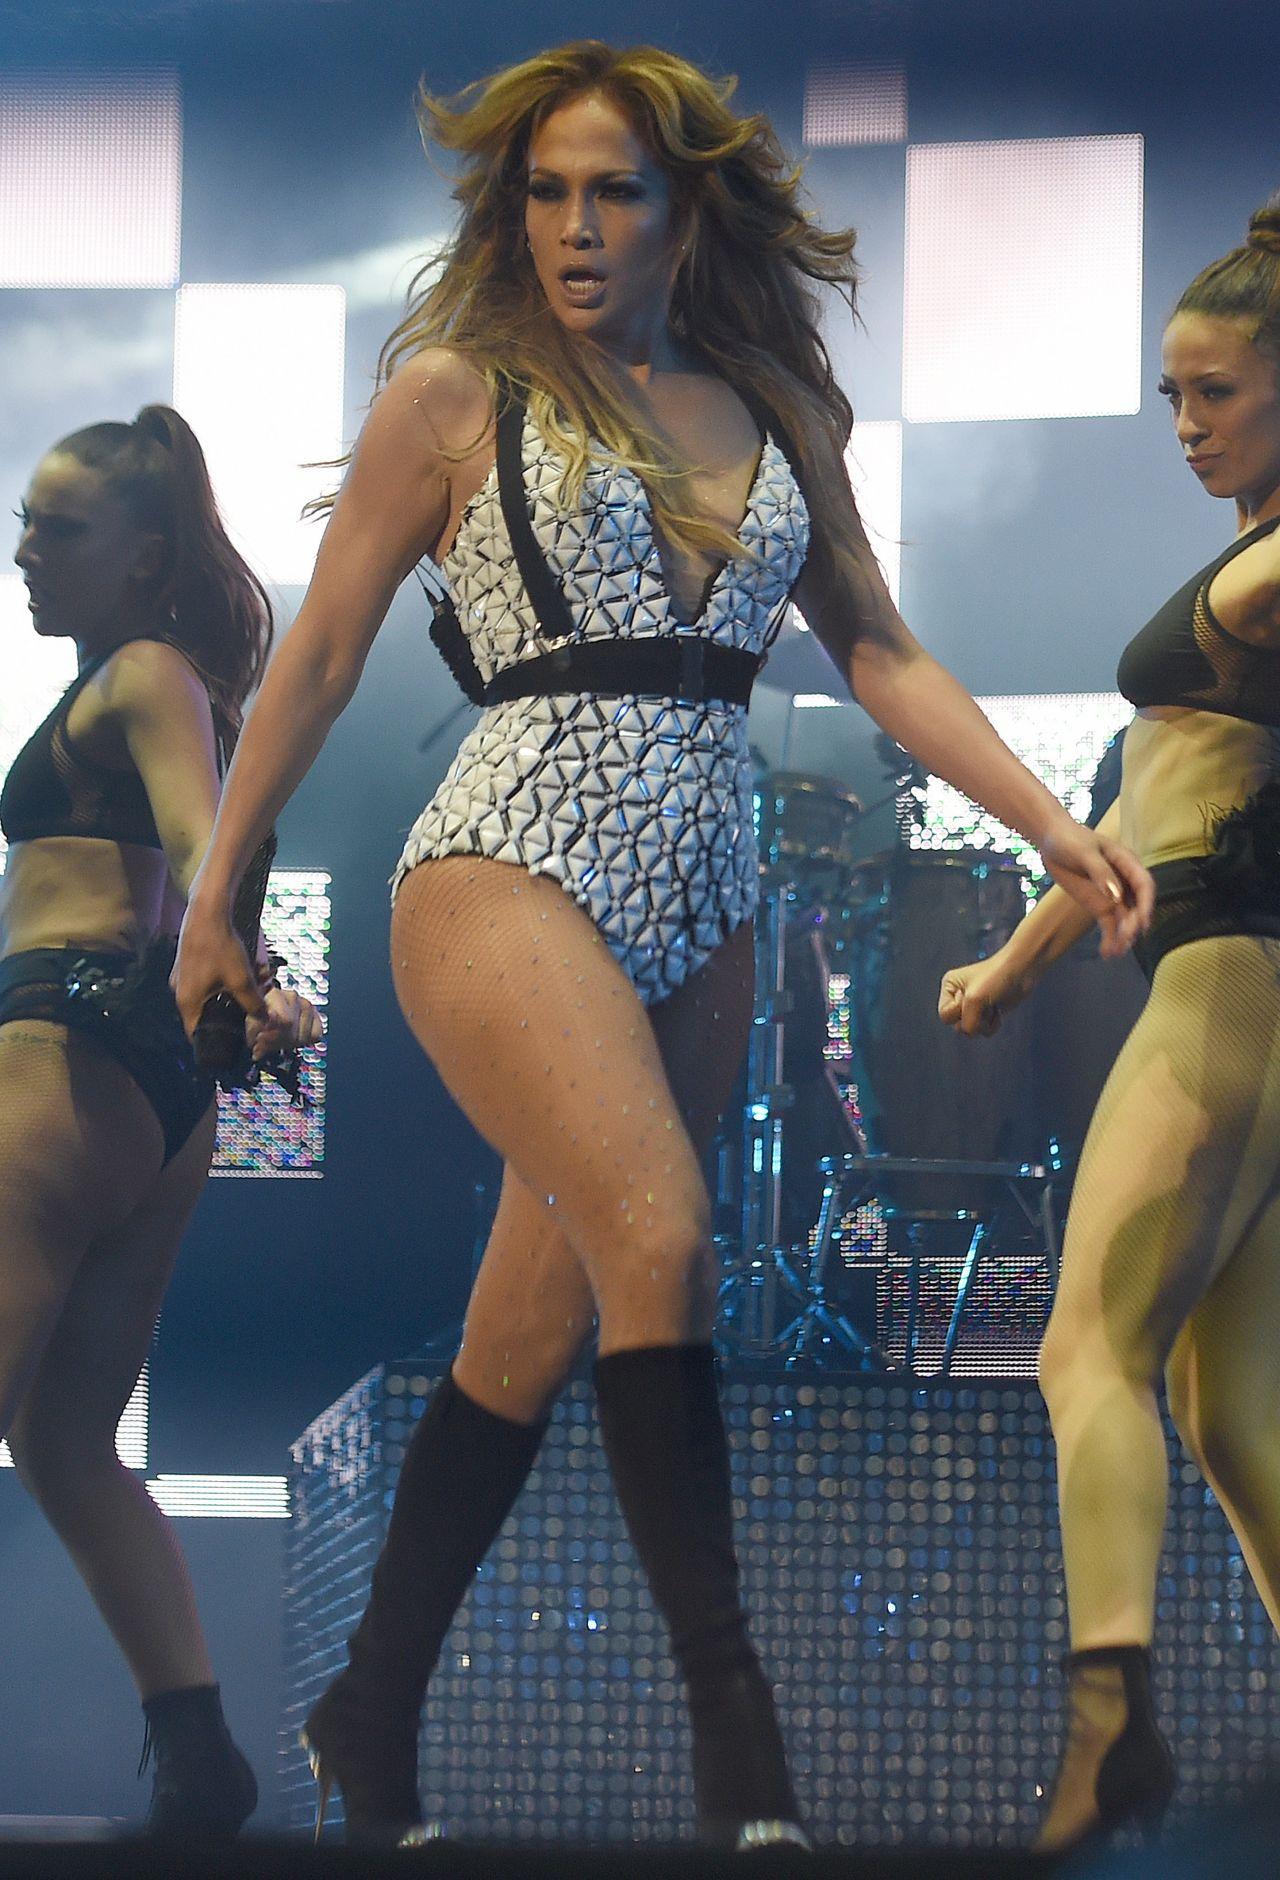 Jennifer Lopez - 2015 Mawazine International Music Festival in Rabat, Morocco